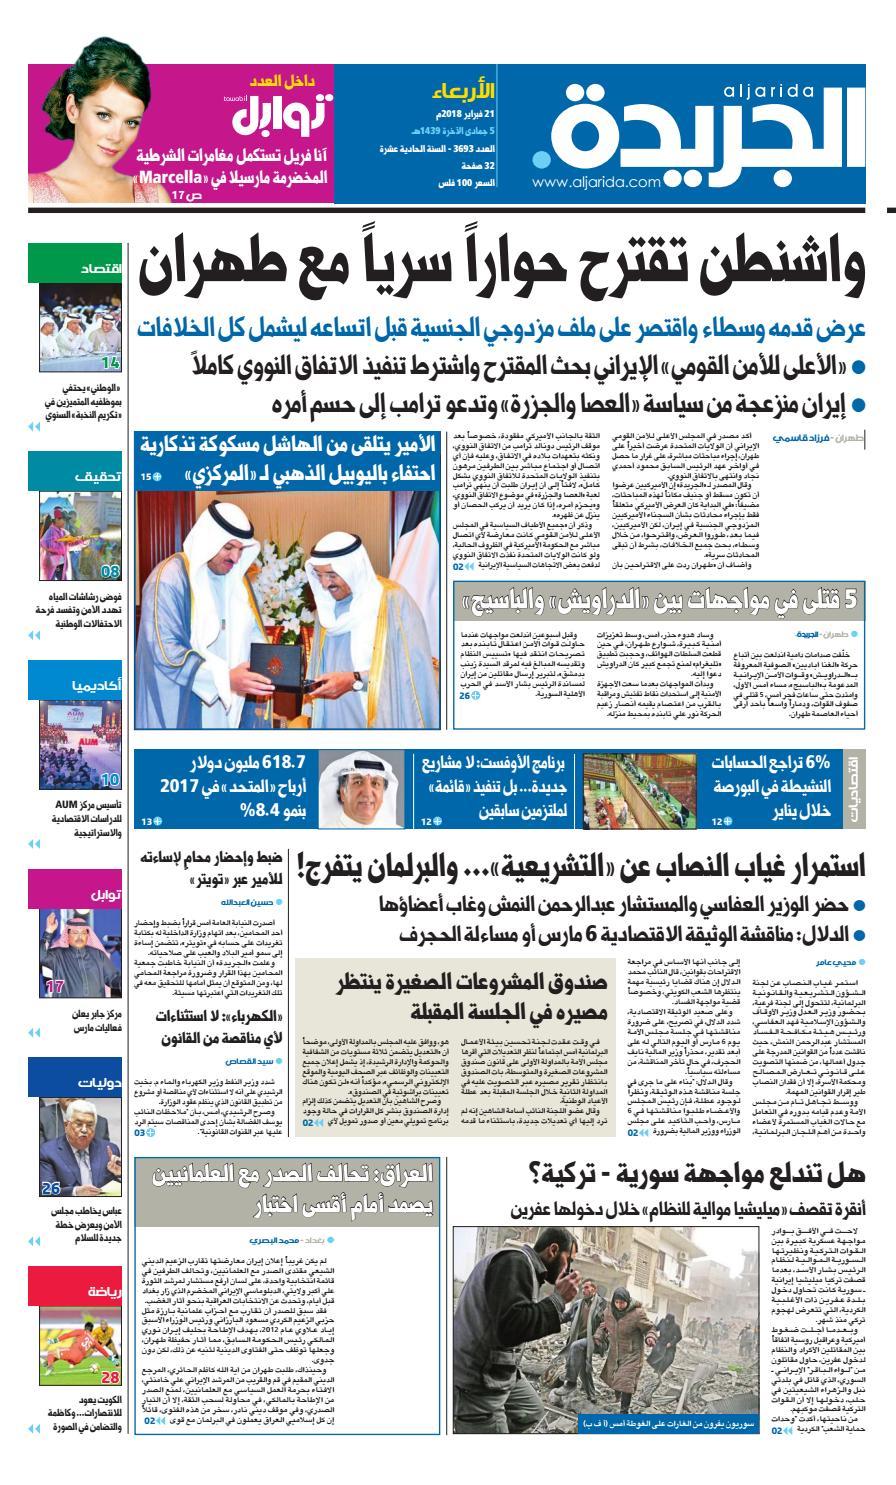 deeaba9c5 عدد الجريدة الأربعاء 21 فبراير 2018 by Aljarida Newspaper - issuu